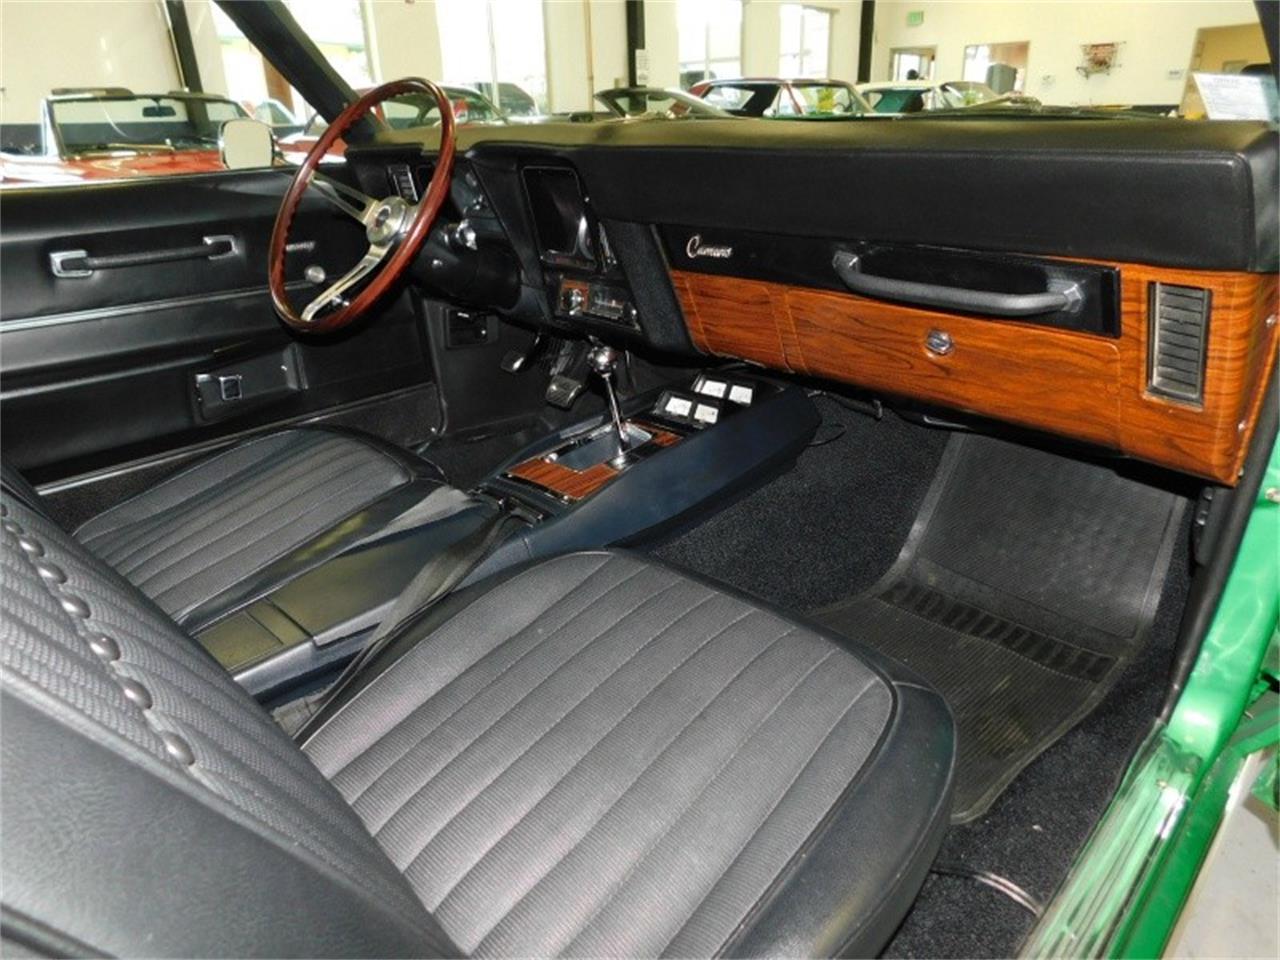 1969 Chevrolet Camaro (CC-1229188) for sale in Bend, Oregon